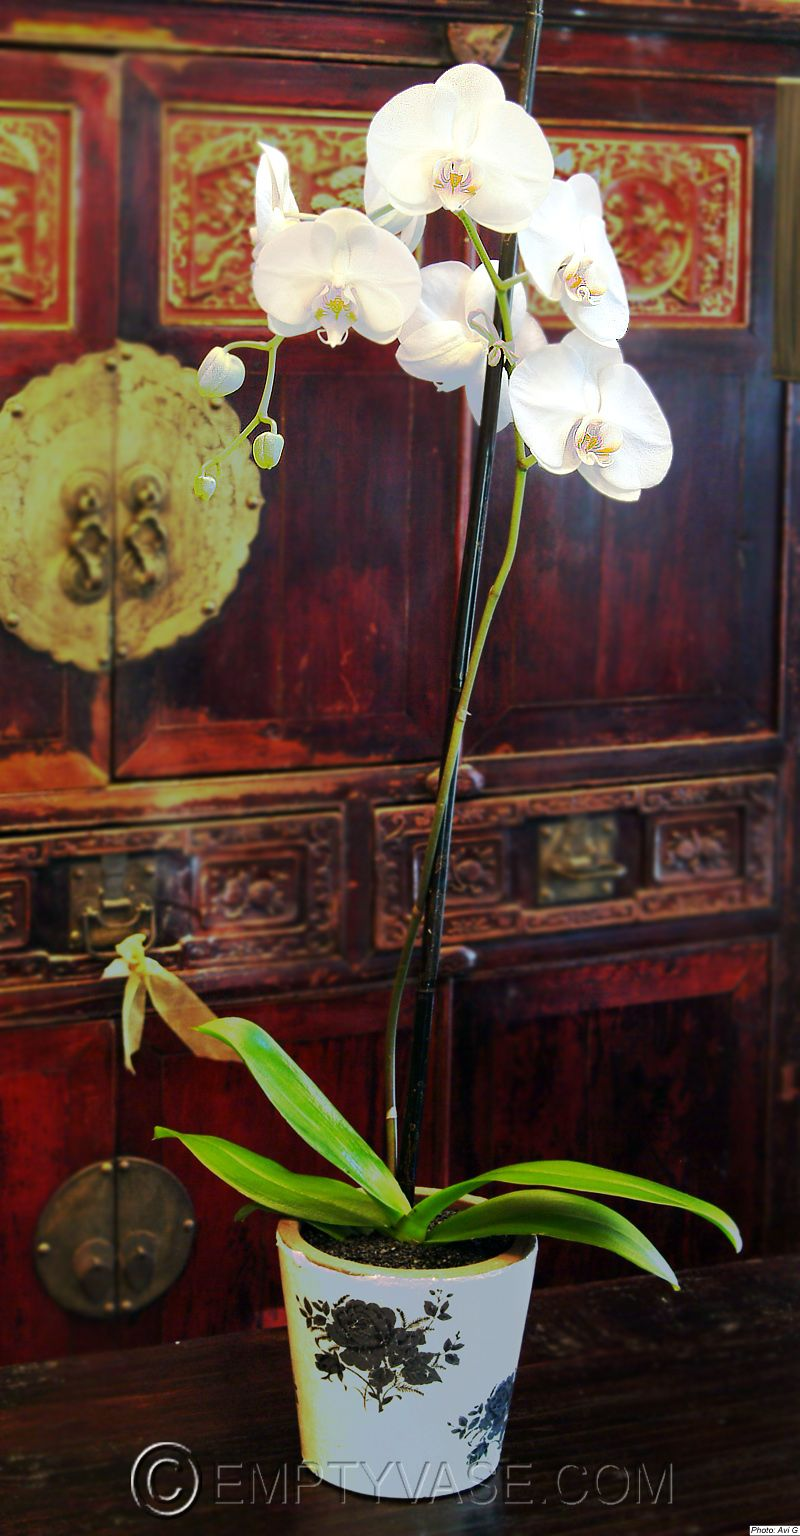 A single stem elegant white phaleonopsis orchid is potted